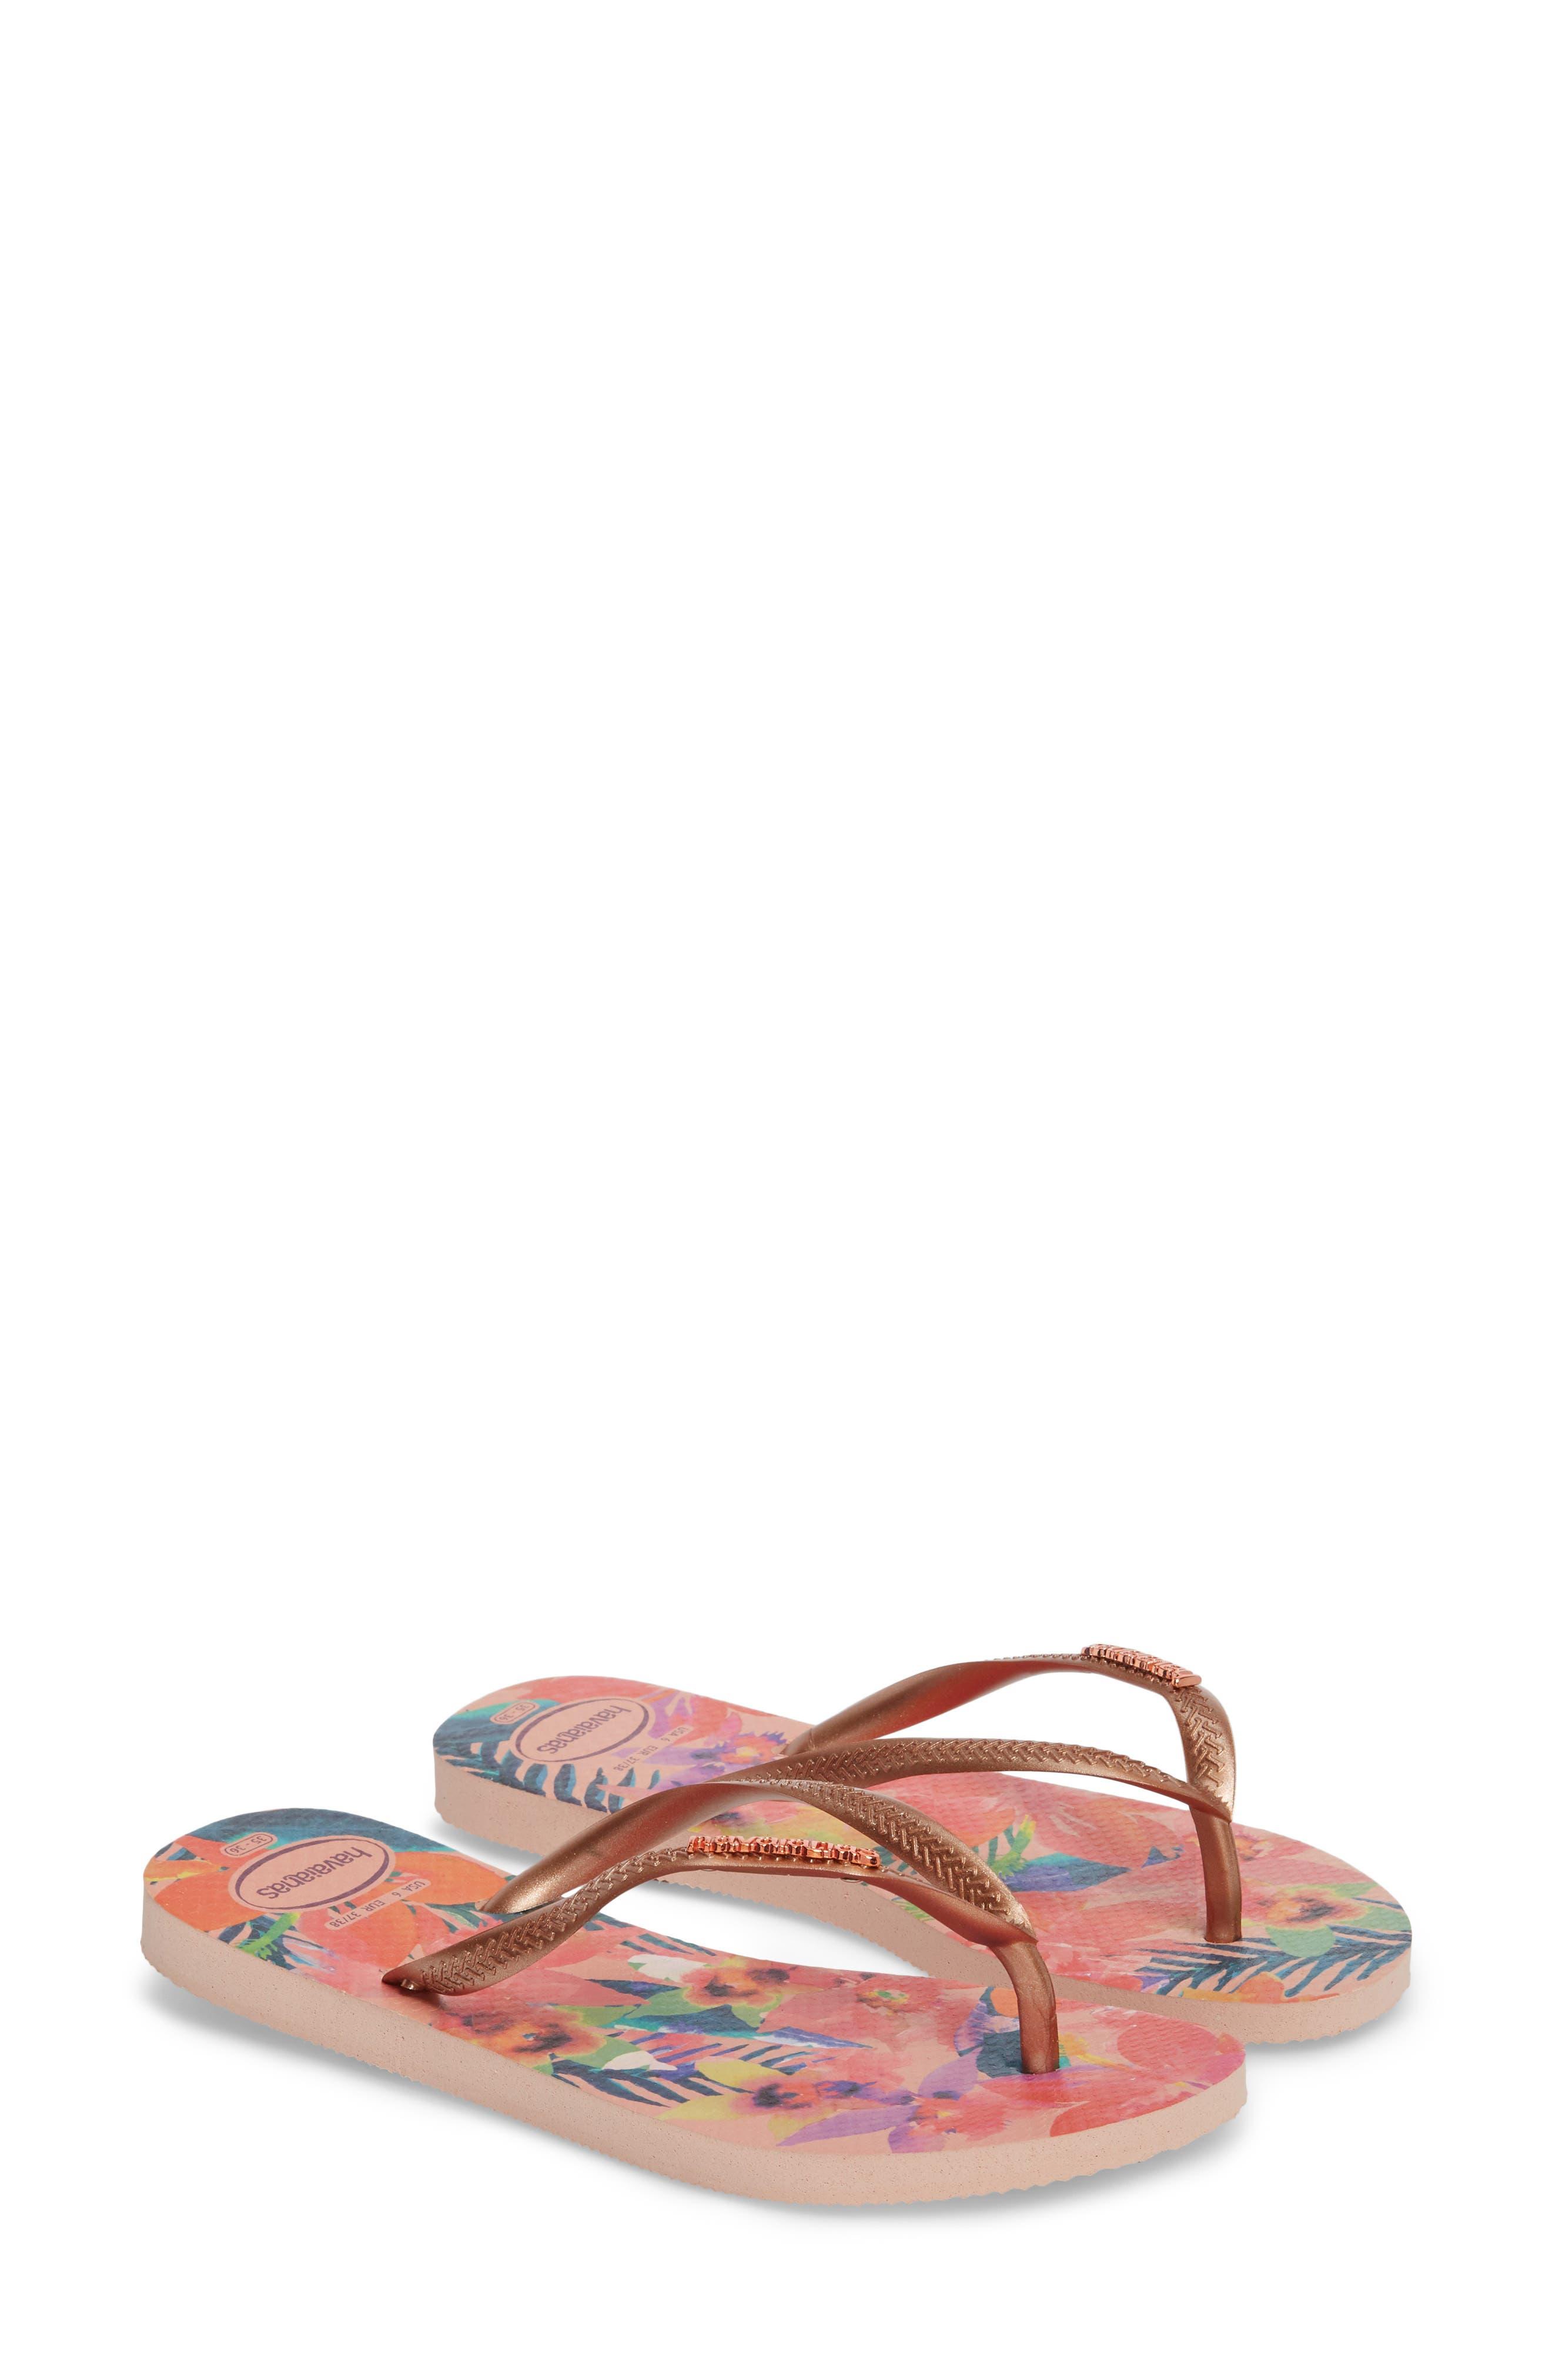 'Slim Tropical' Flip Flop,                             Alternate thumbnail 2, color,                             BALLET ROSE